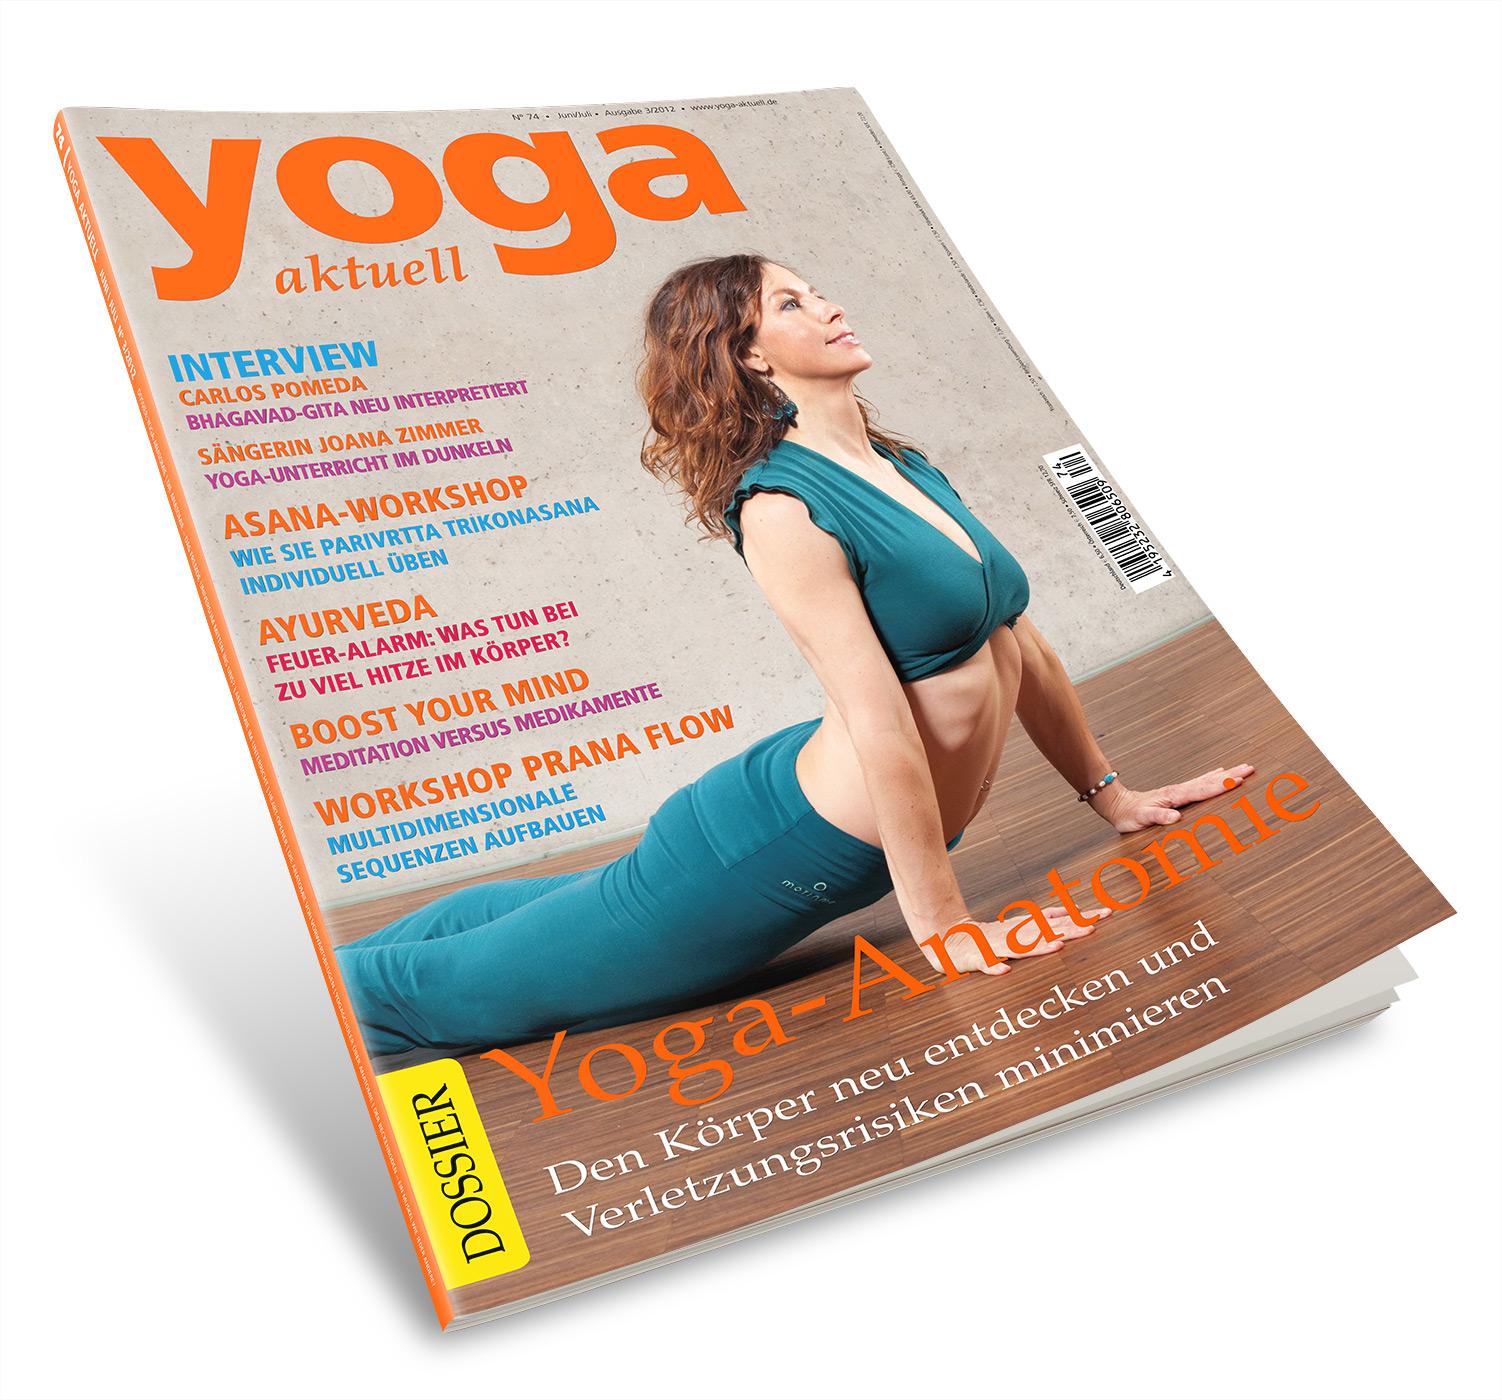 Yoga Aktuell 74 - 03/2012